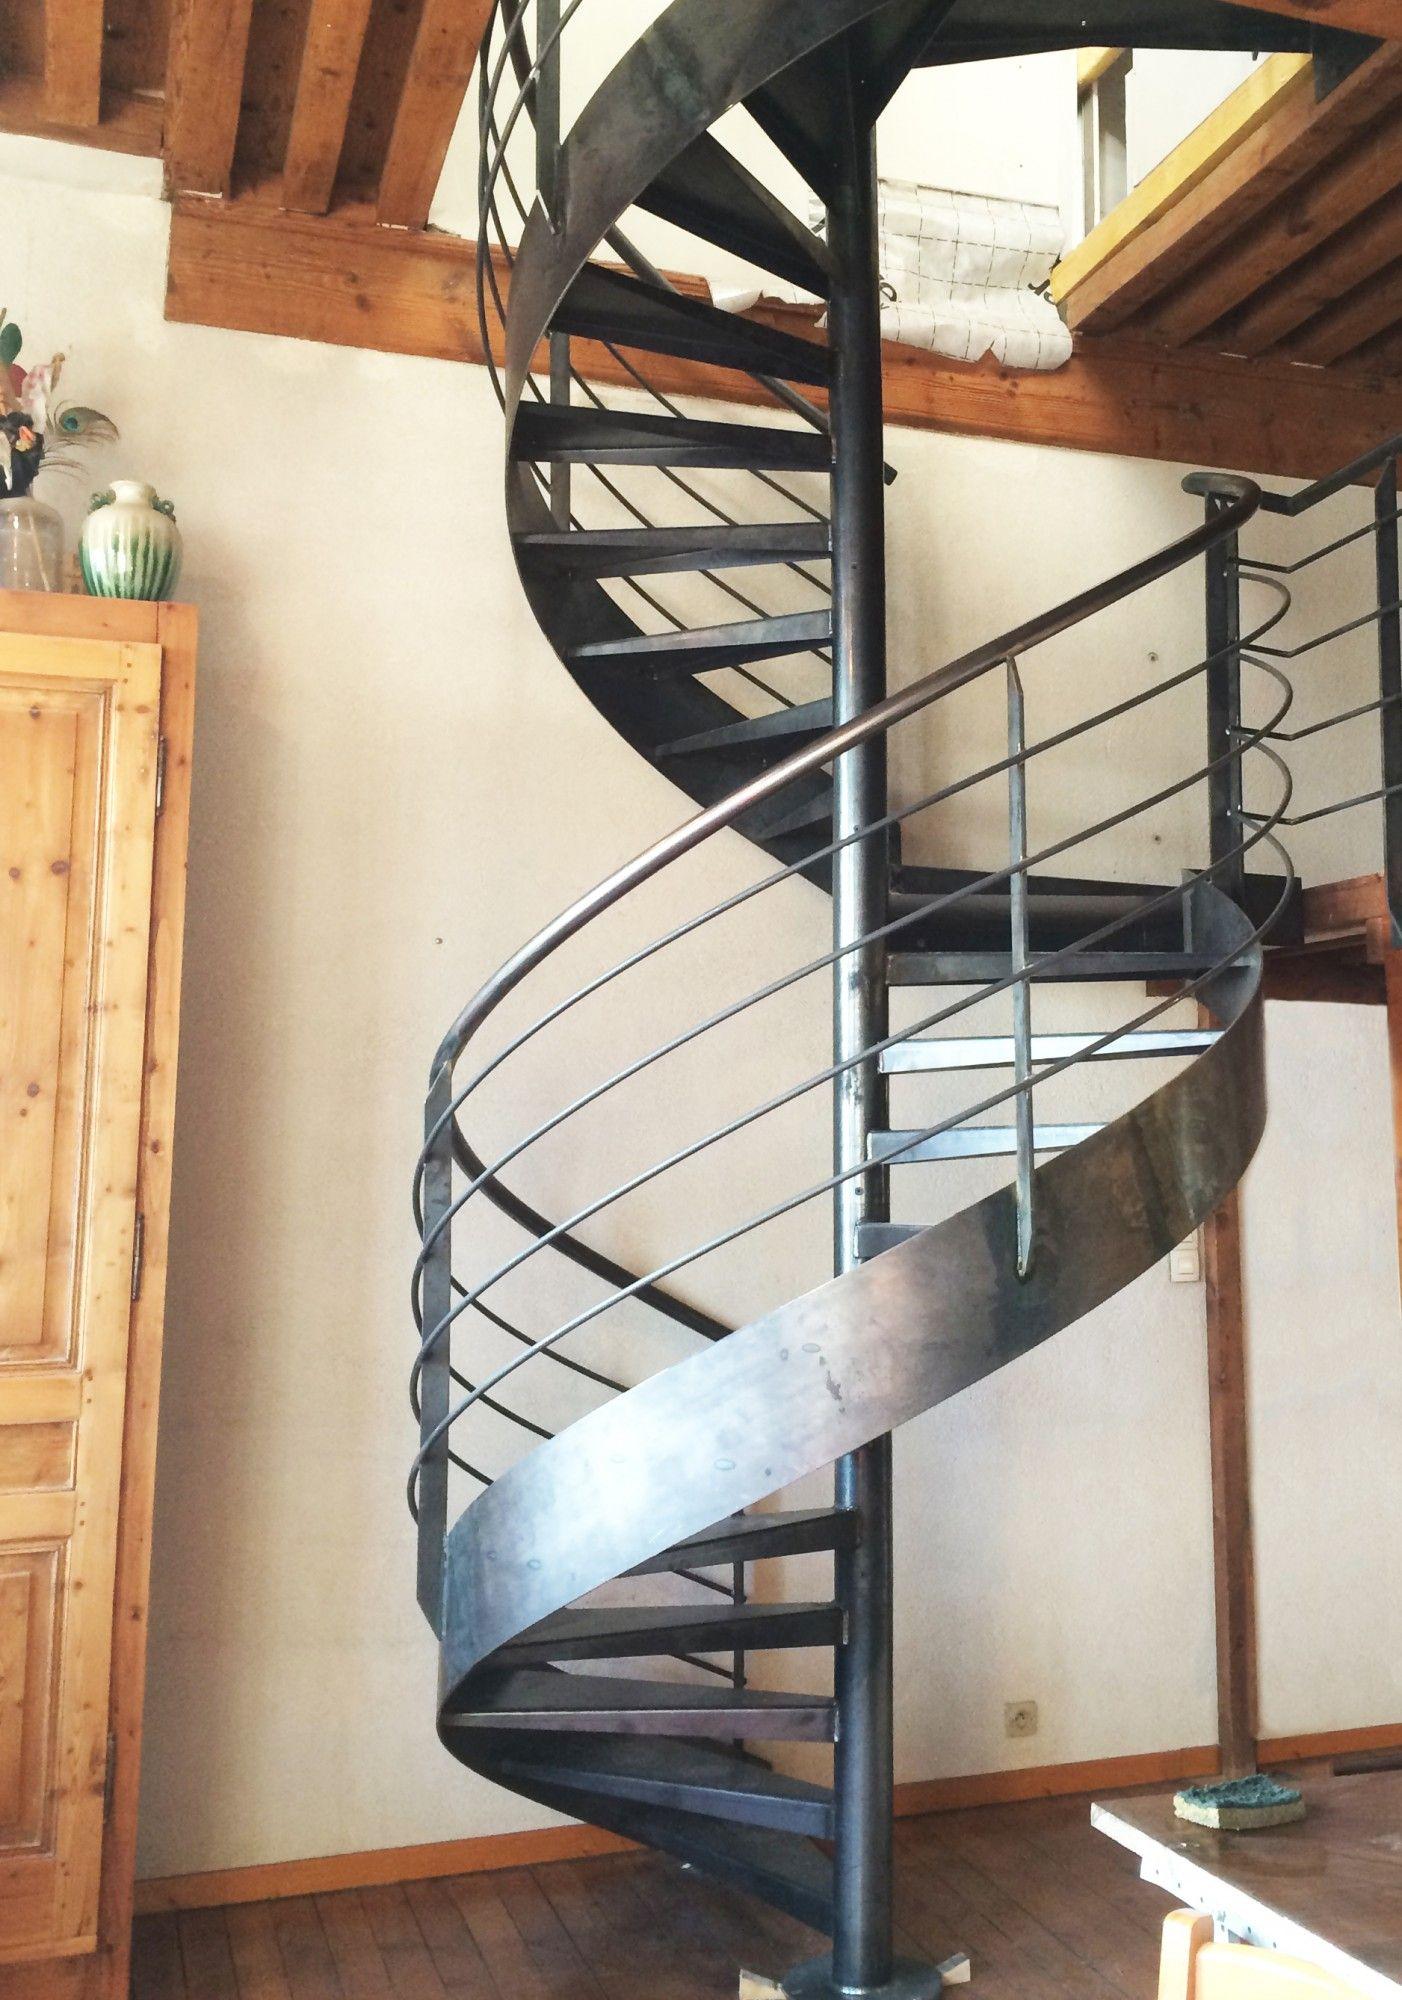 Barriere Escalier En Colimaçon escalier en métal en colimaçon pas cher à lyon | escalier